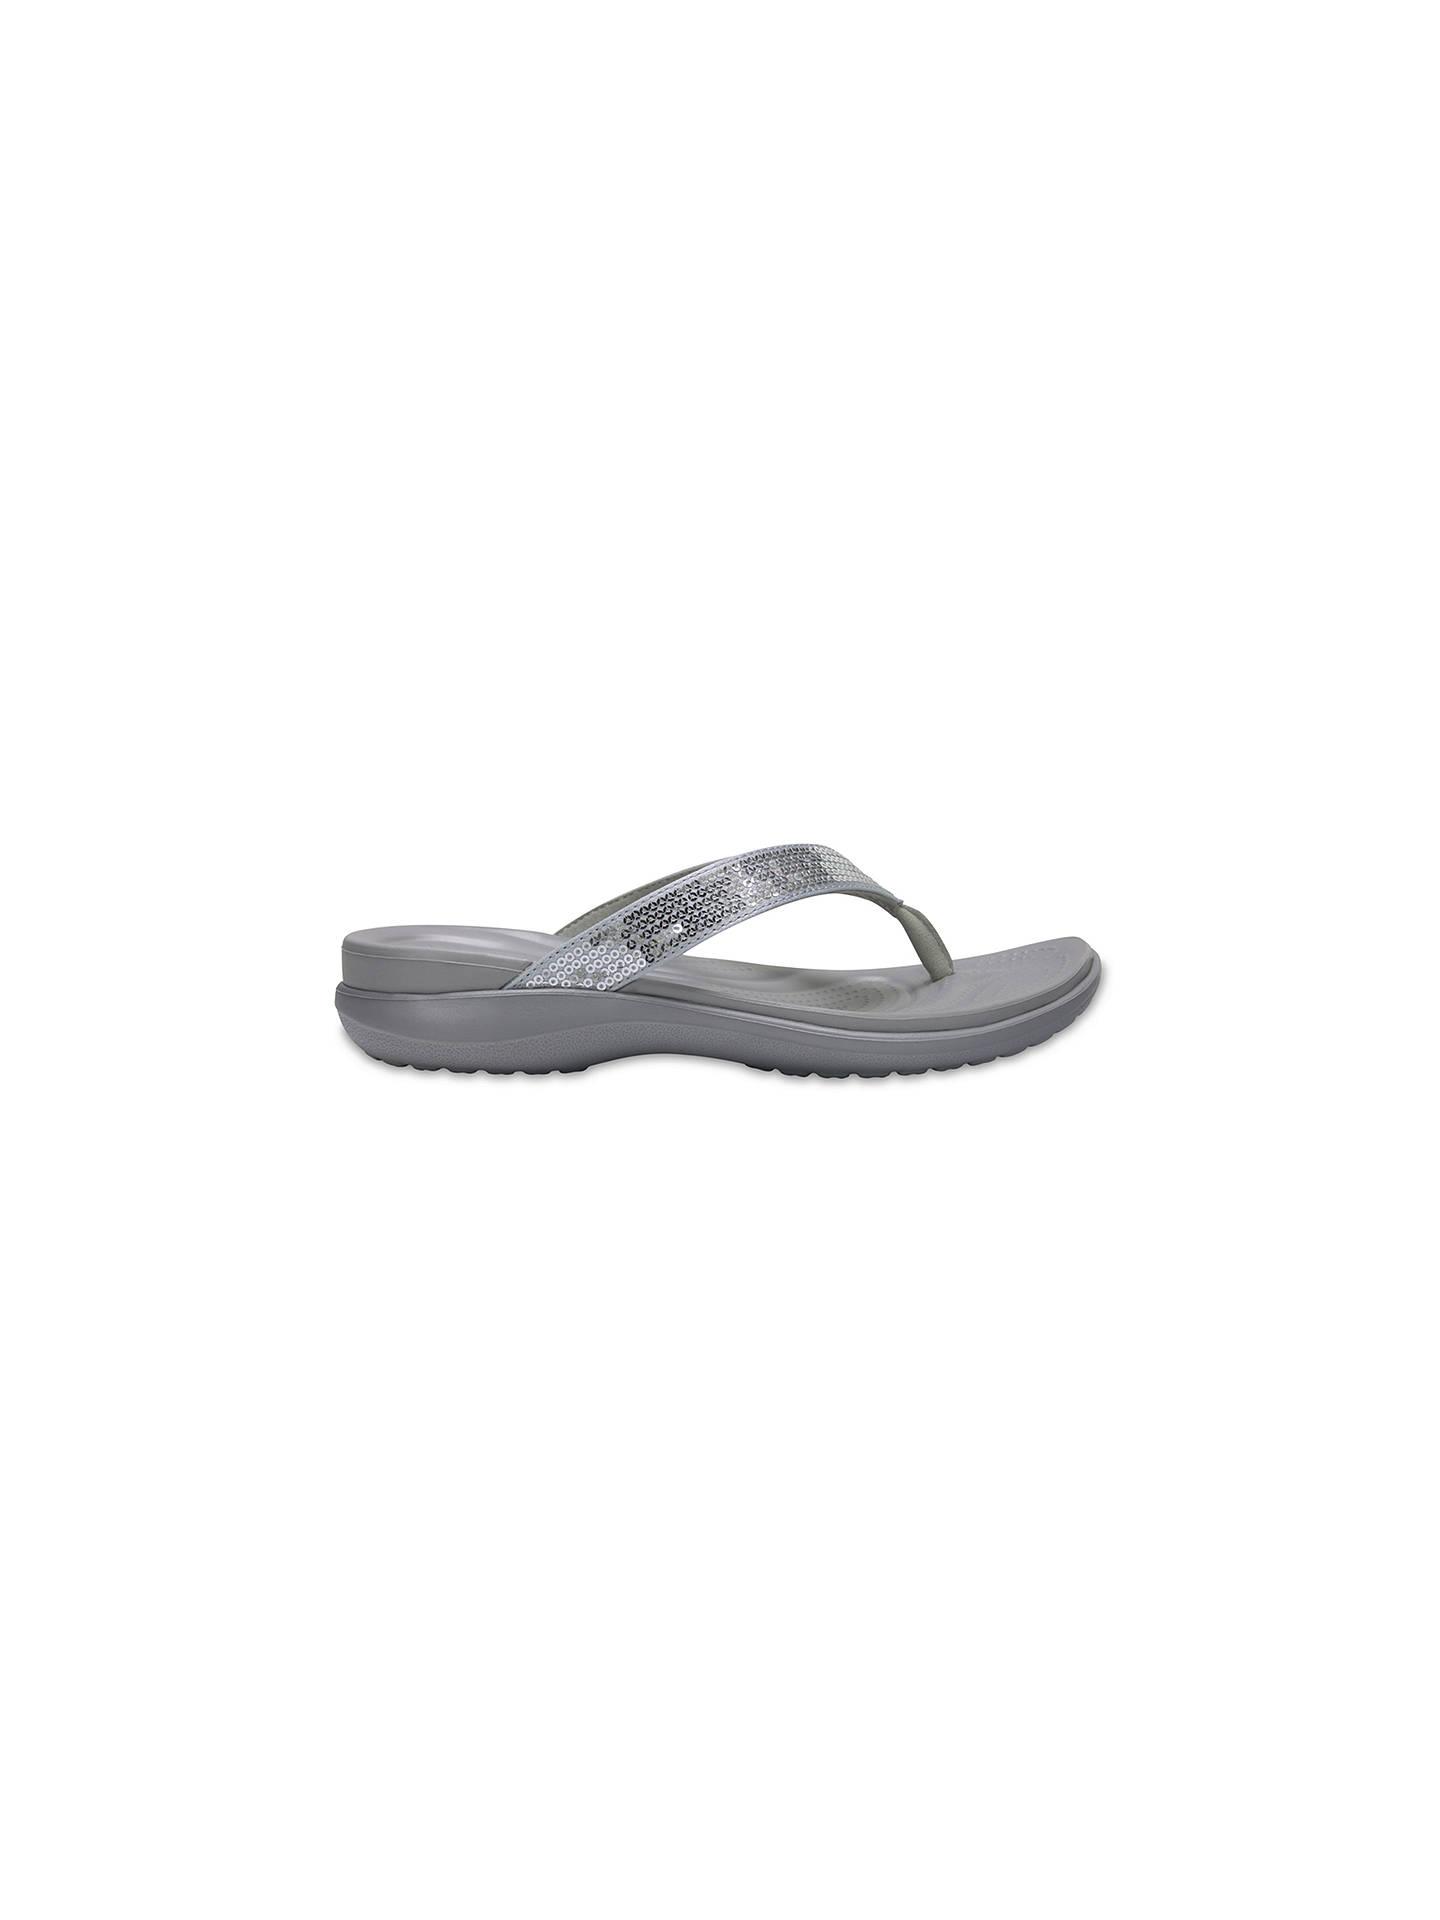 crocs Women/'s Caprivflip Open Back Slippers Floral//Light Grey Grey